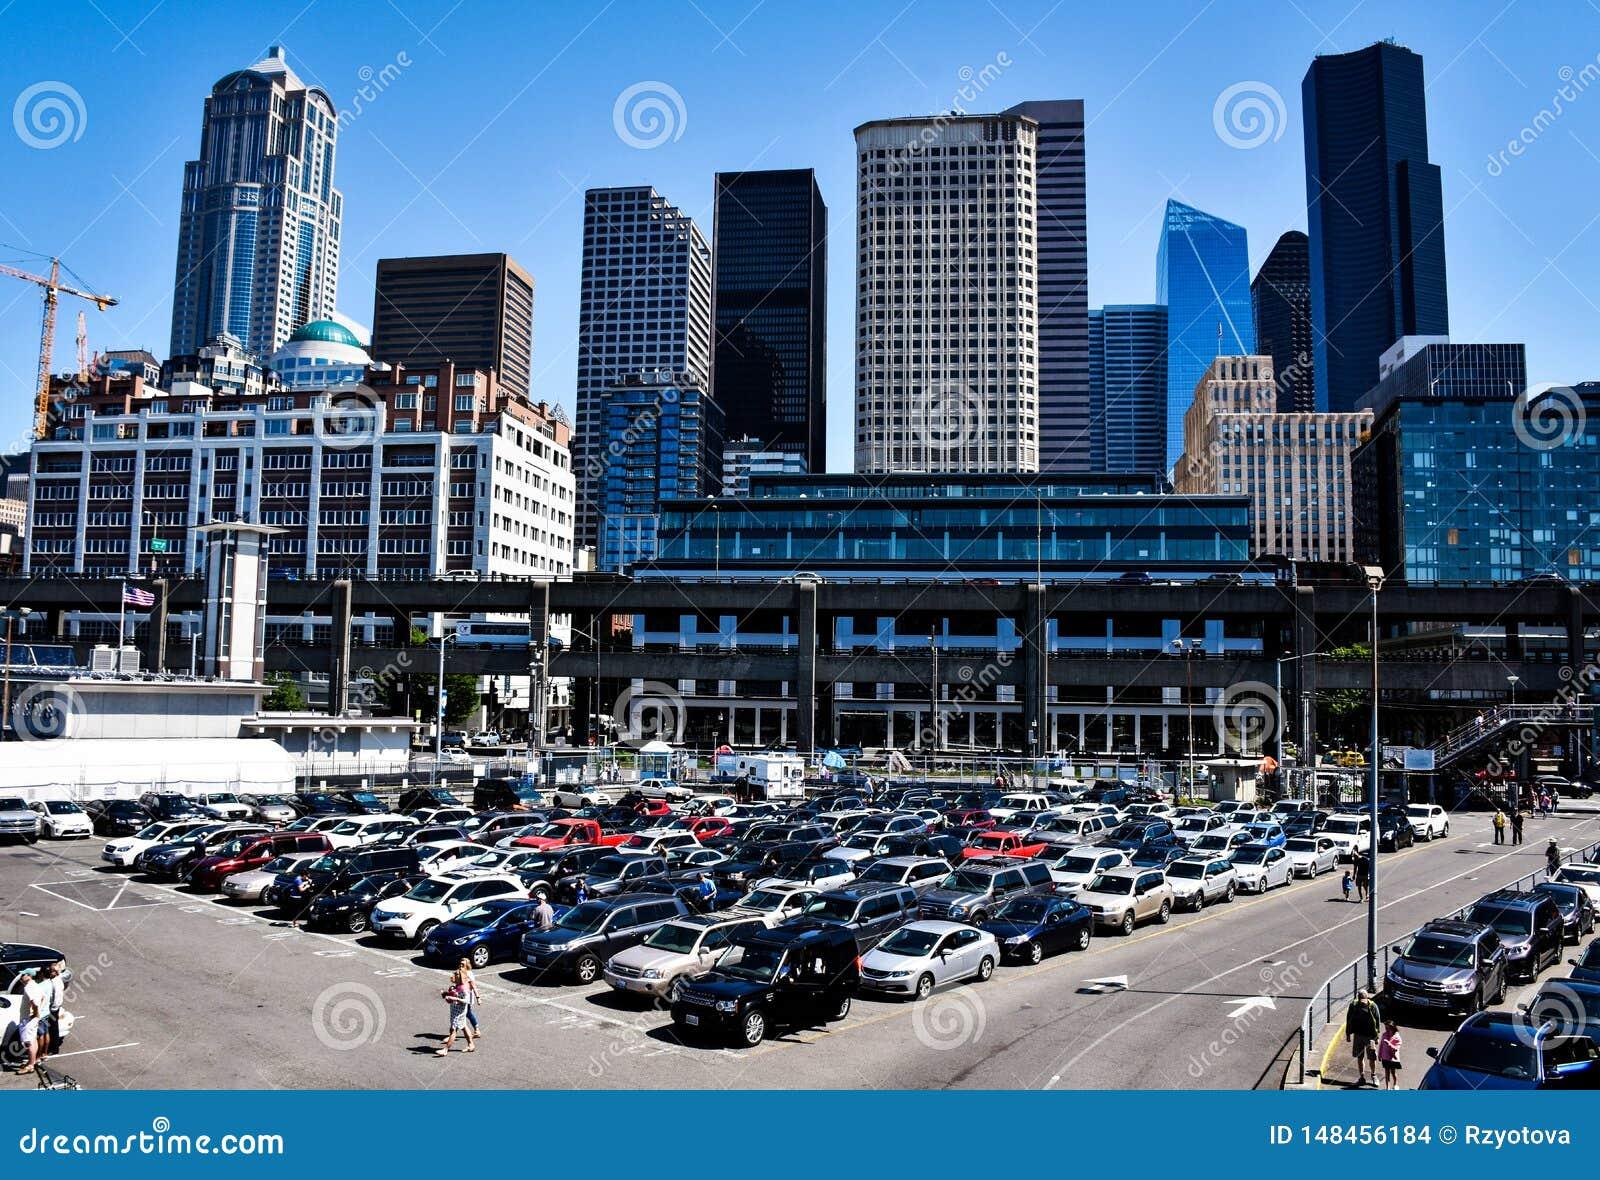 Parking In Seattle, Washington, USA Stock Photo - Image of city